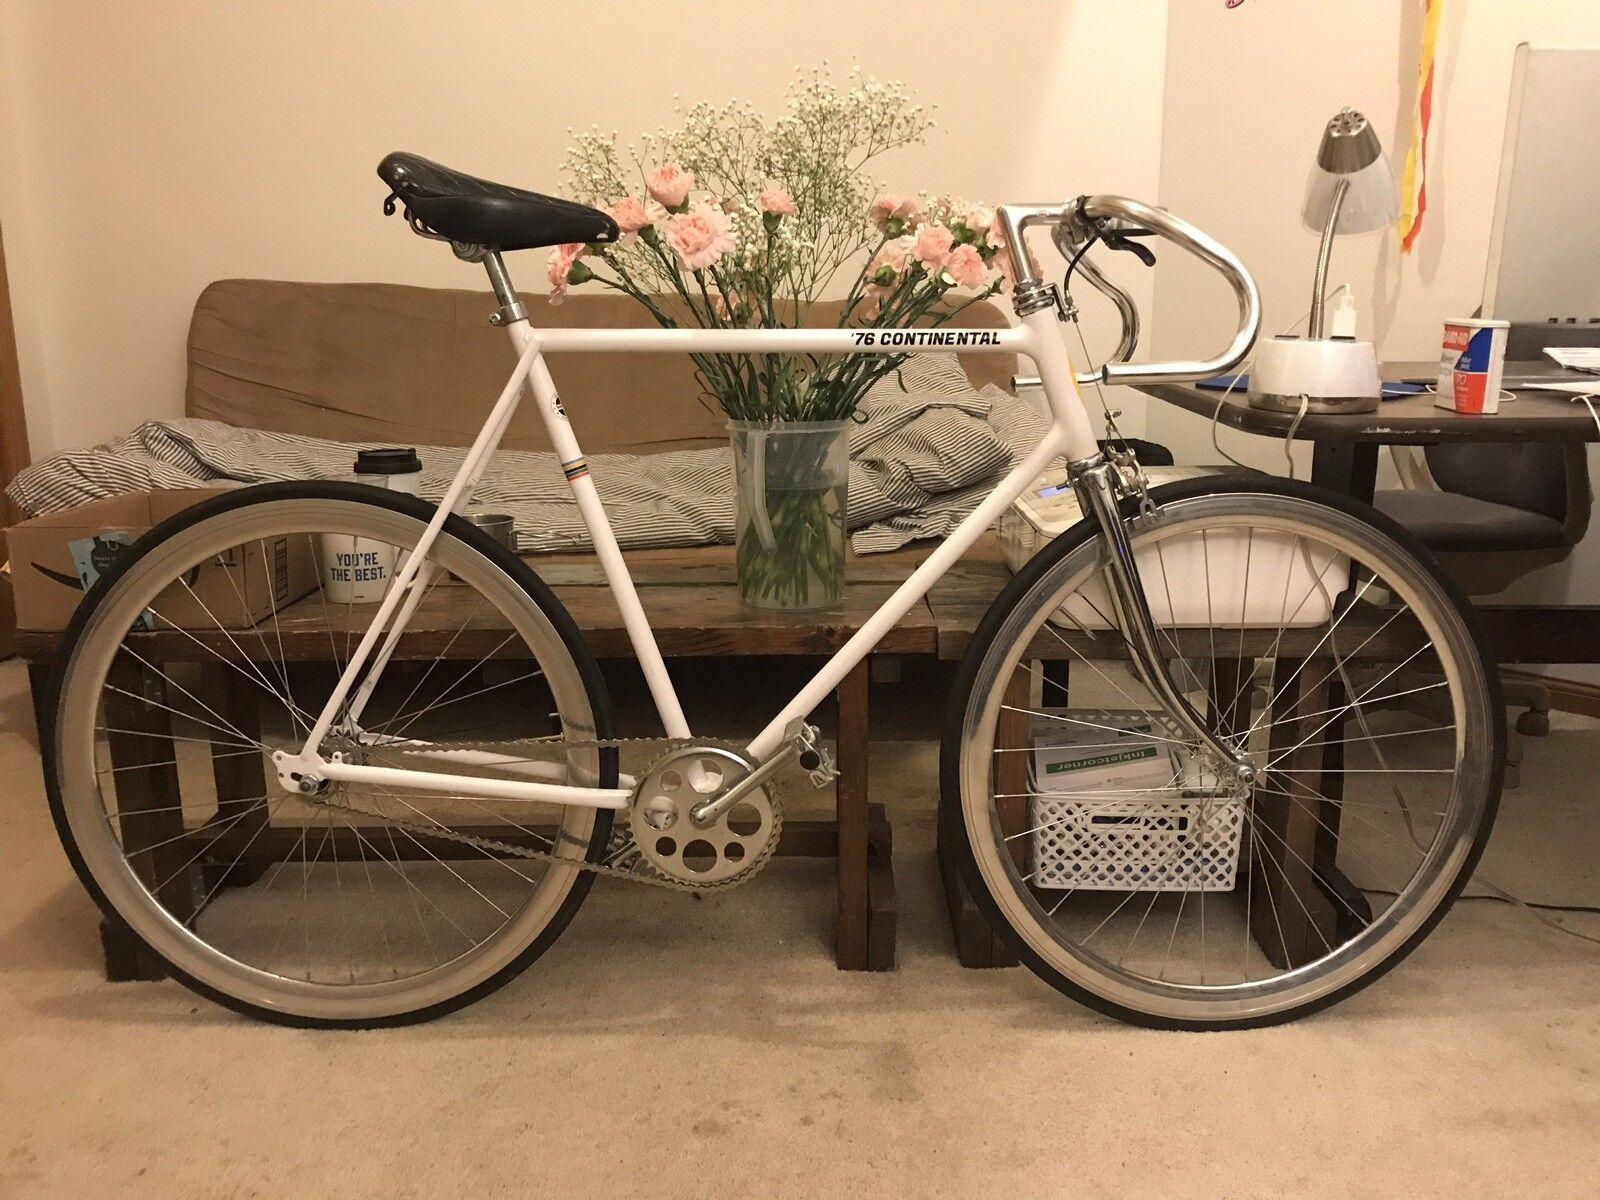 Schwinn Continental Fixedgear Singlespeed Bike Bicycle